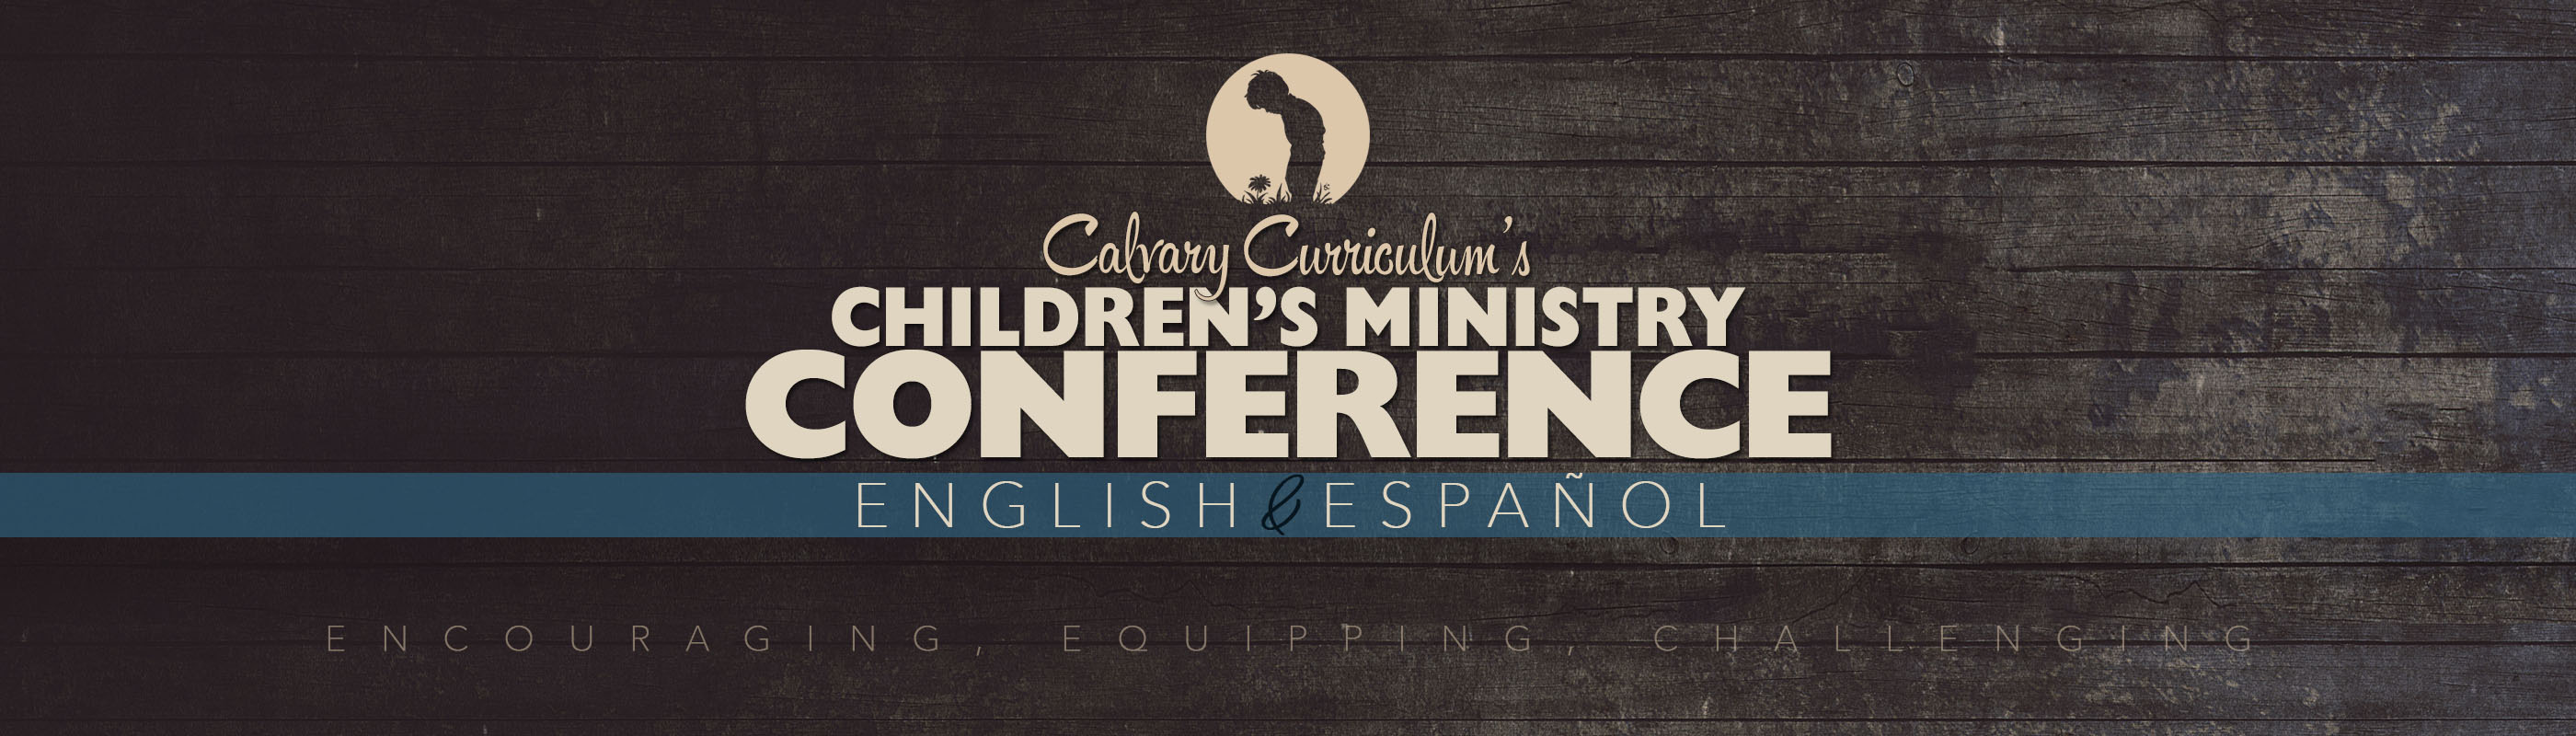 CC's Children's Ministry Conferences